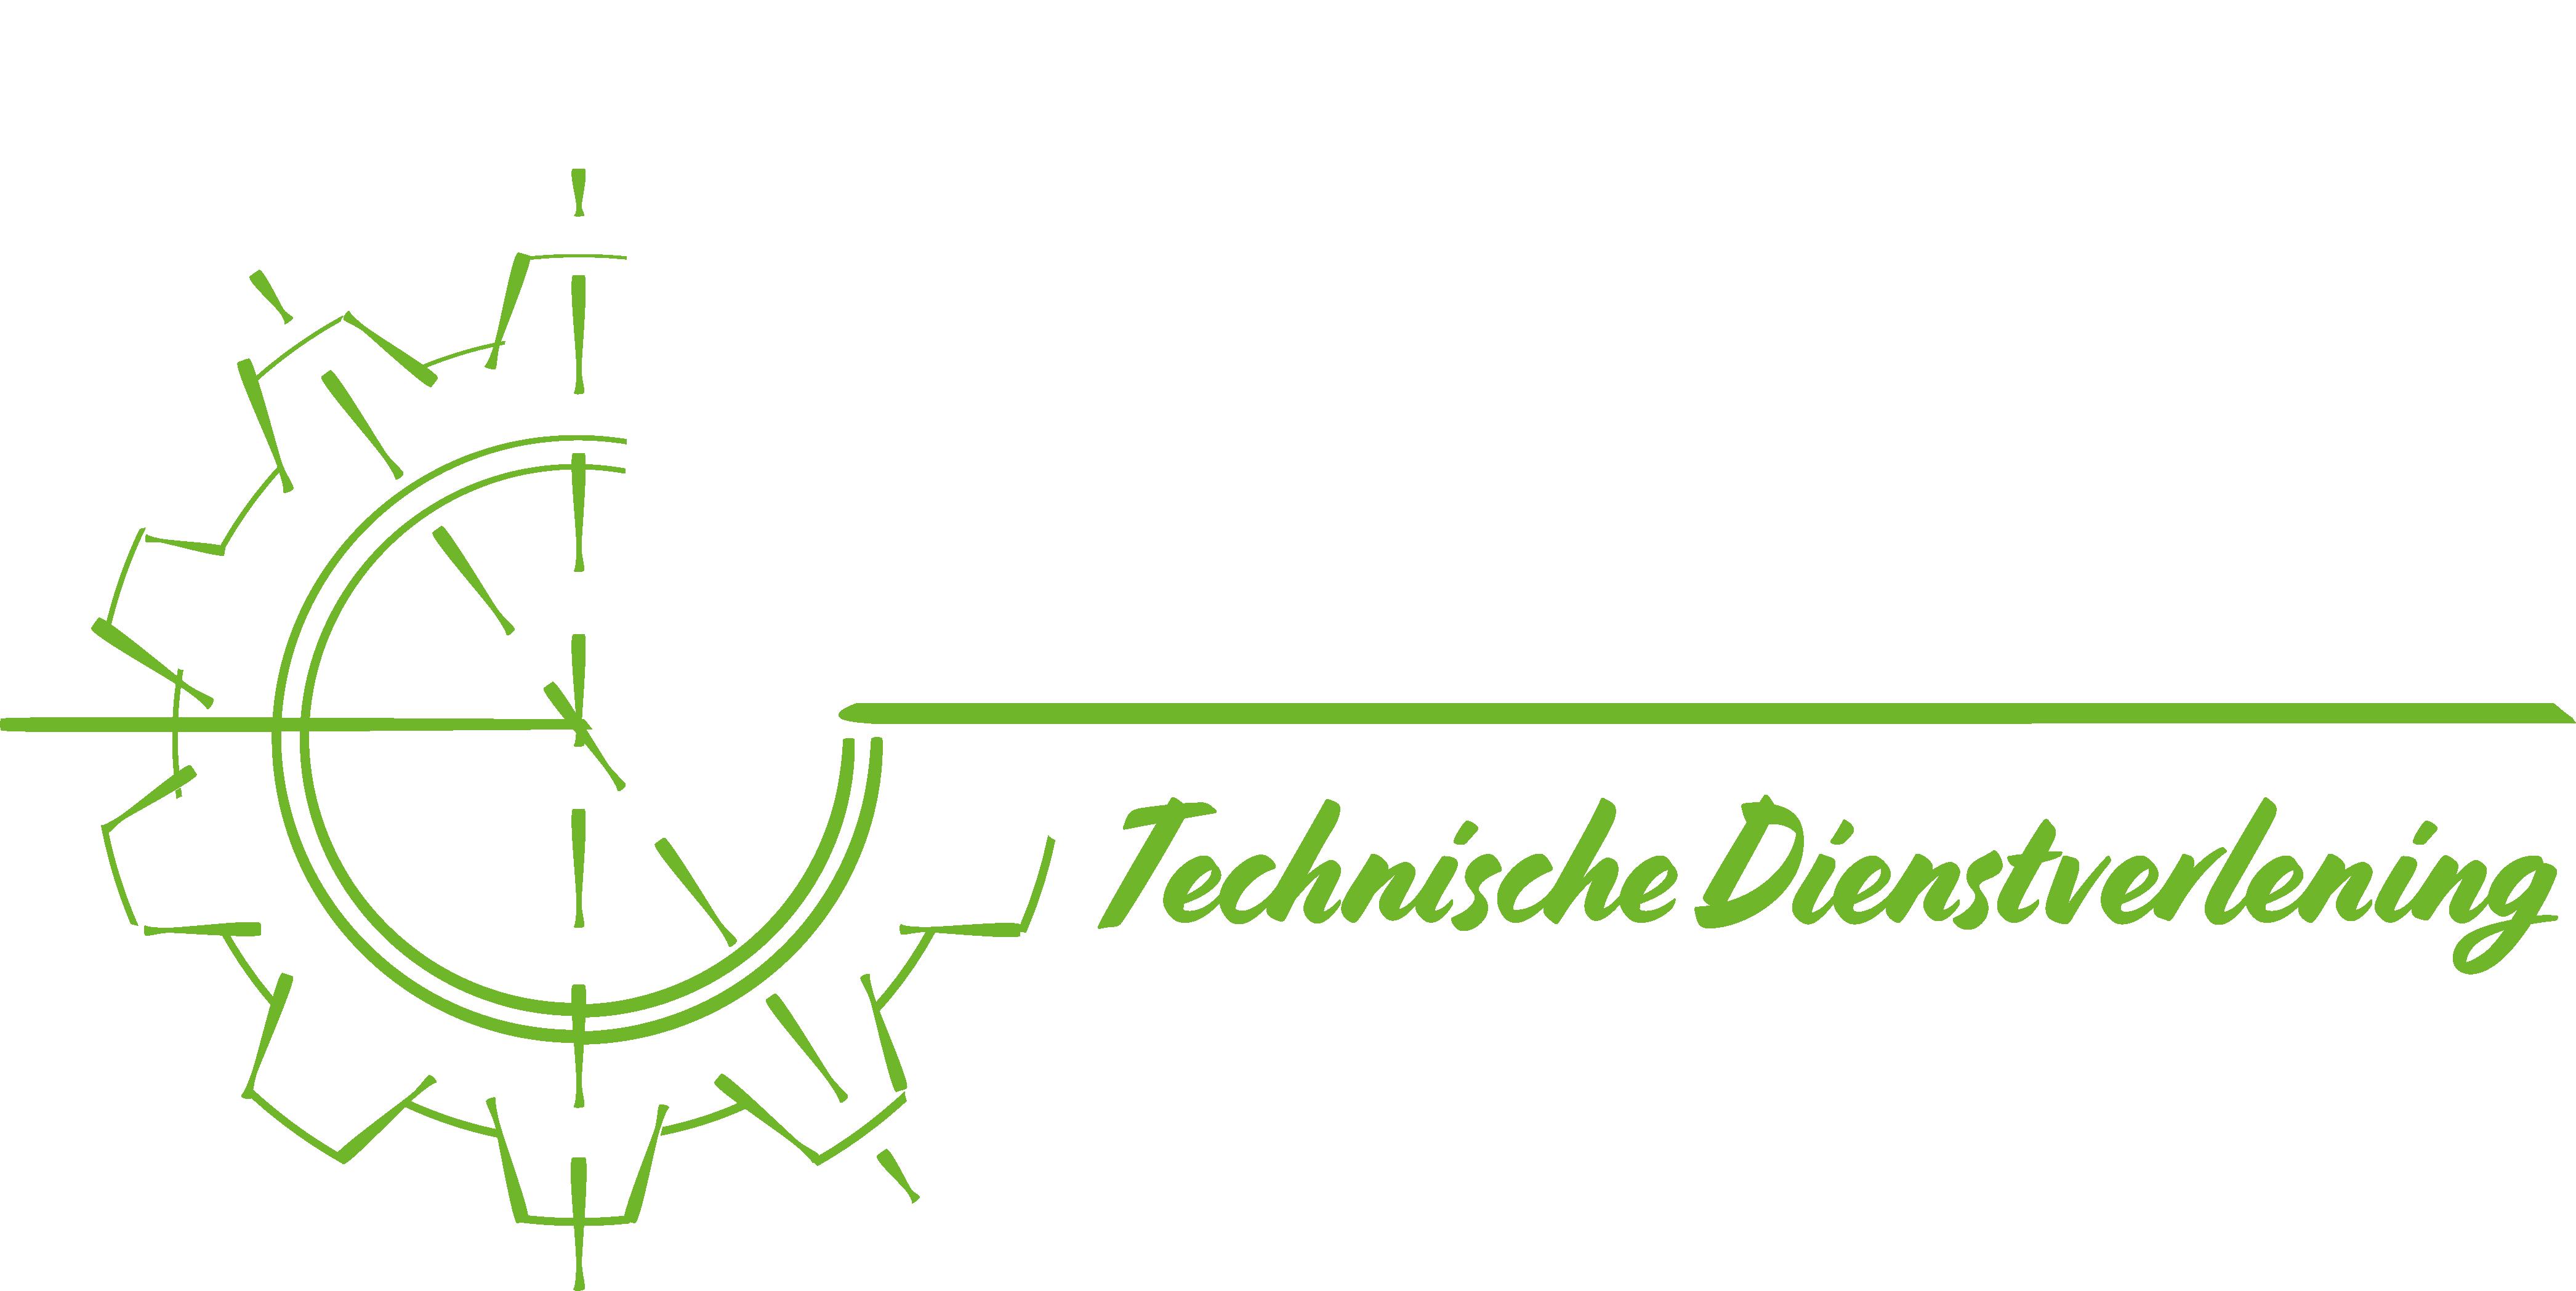 Kalis Technische Dienstverlening